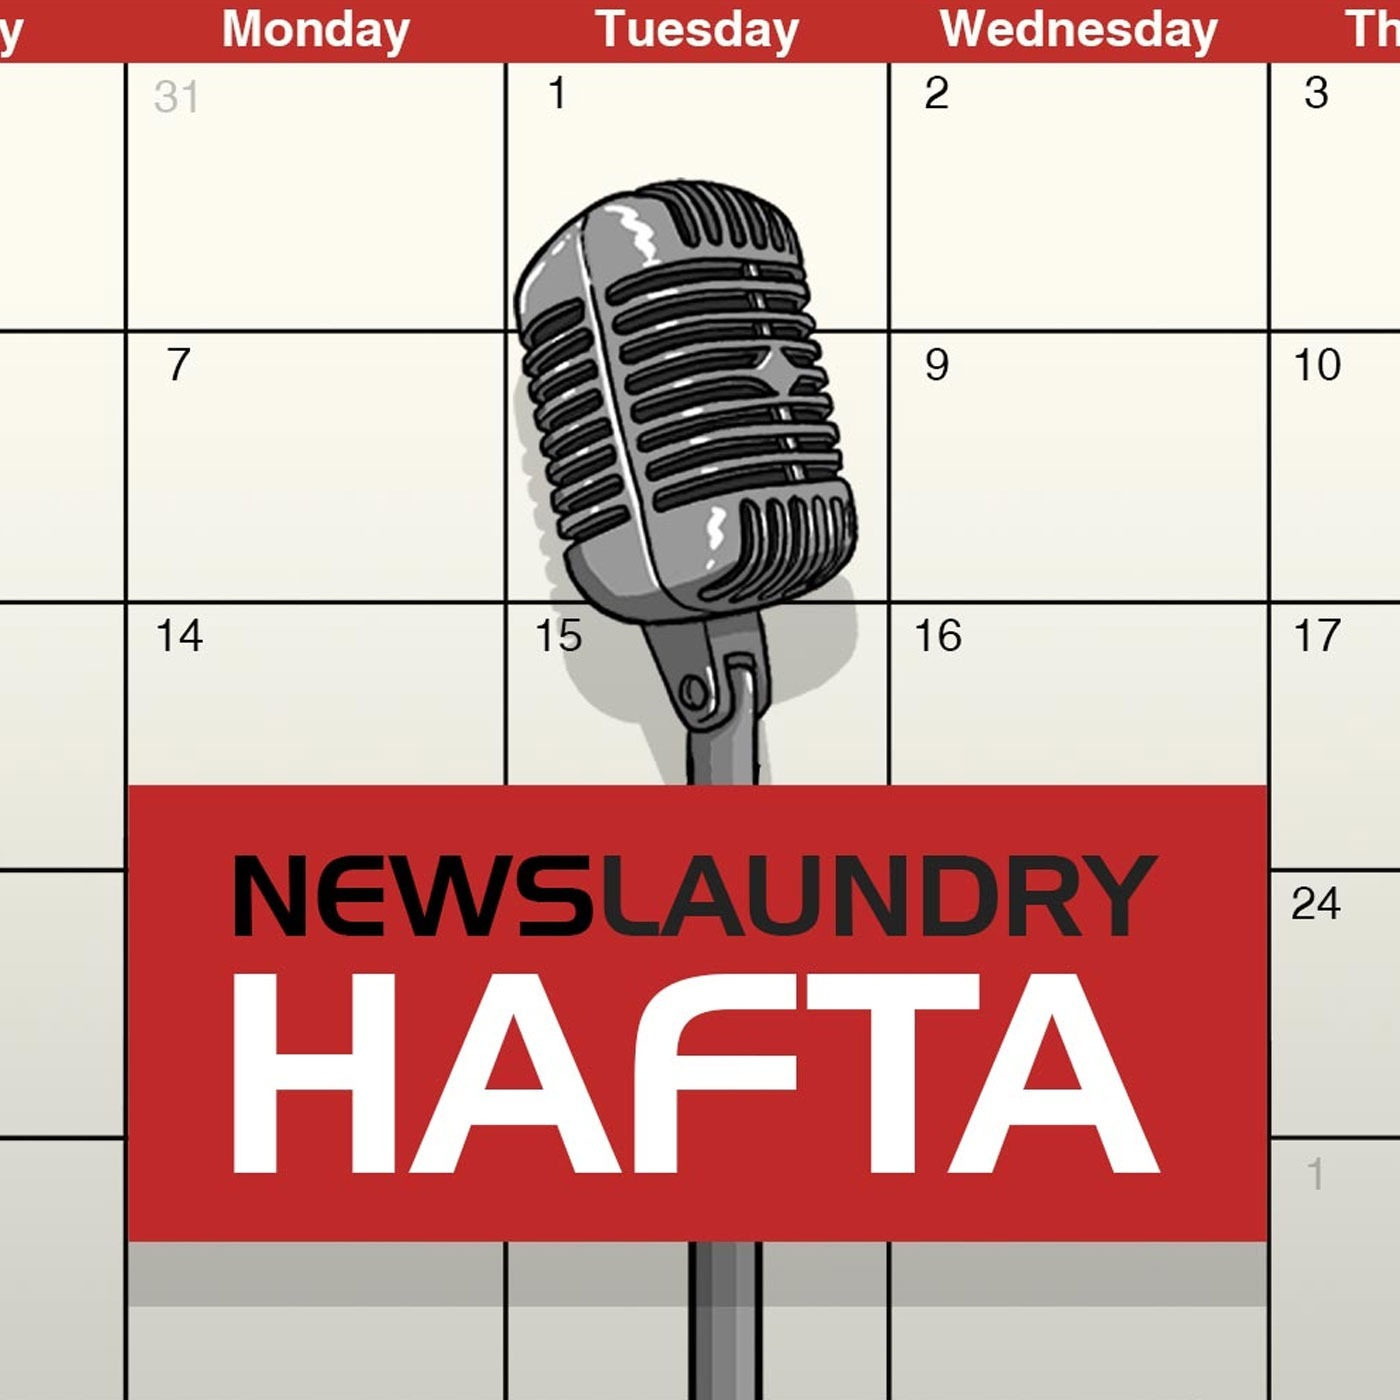 Hafta 231: #Budget2019, #RahulGandhi's resignation, Chandni Chowk violence & more